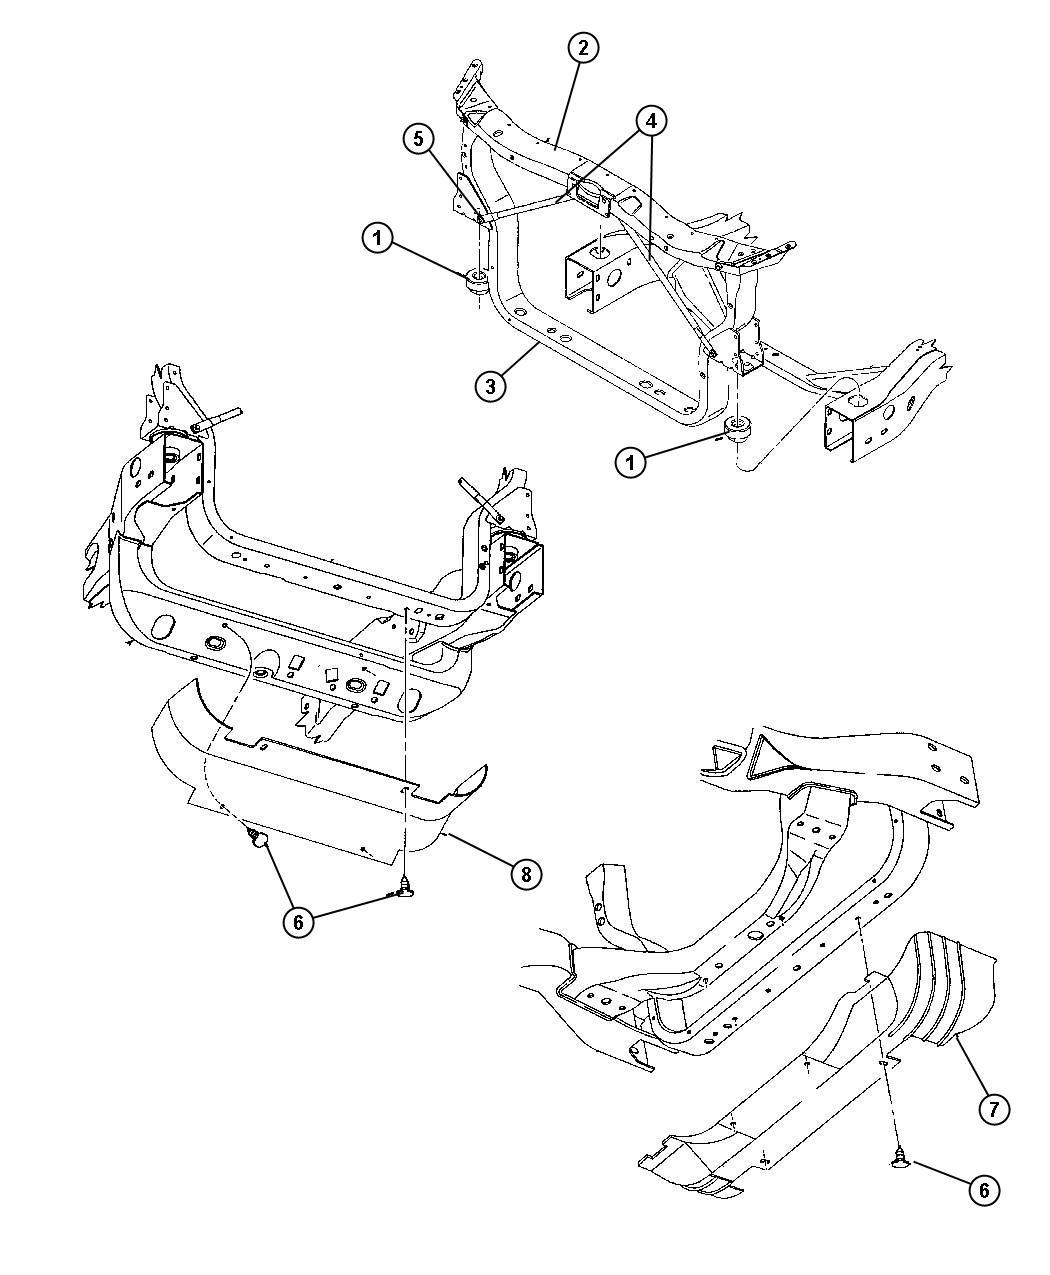 Dodge Durango Radiator Closure And Air Deflector